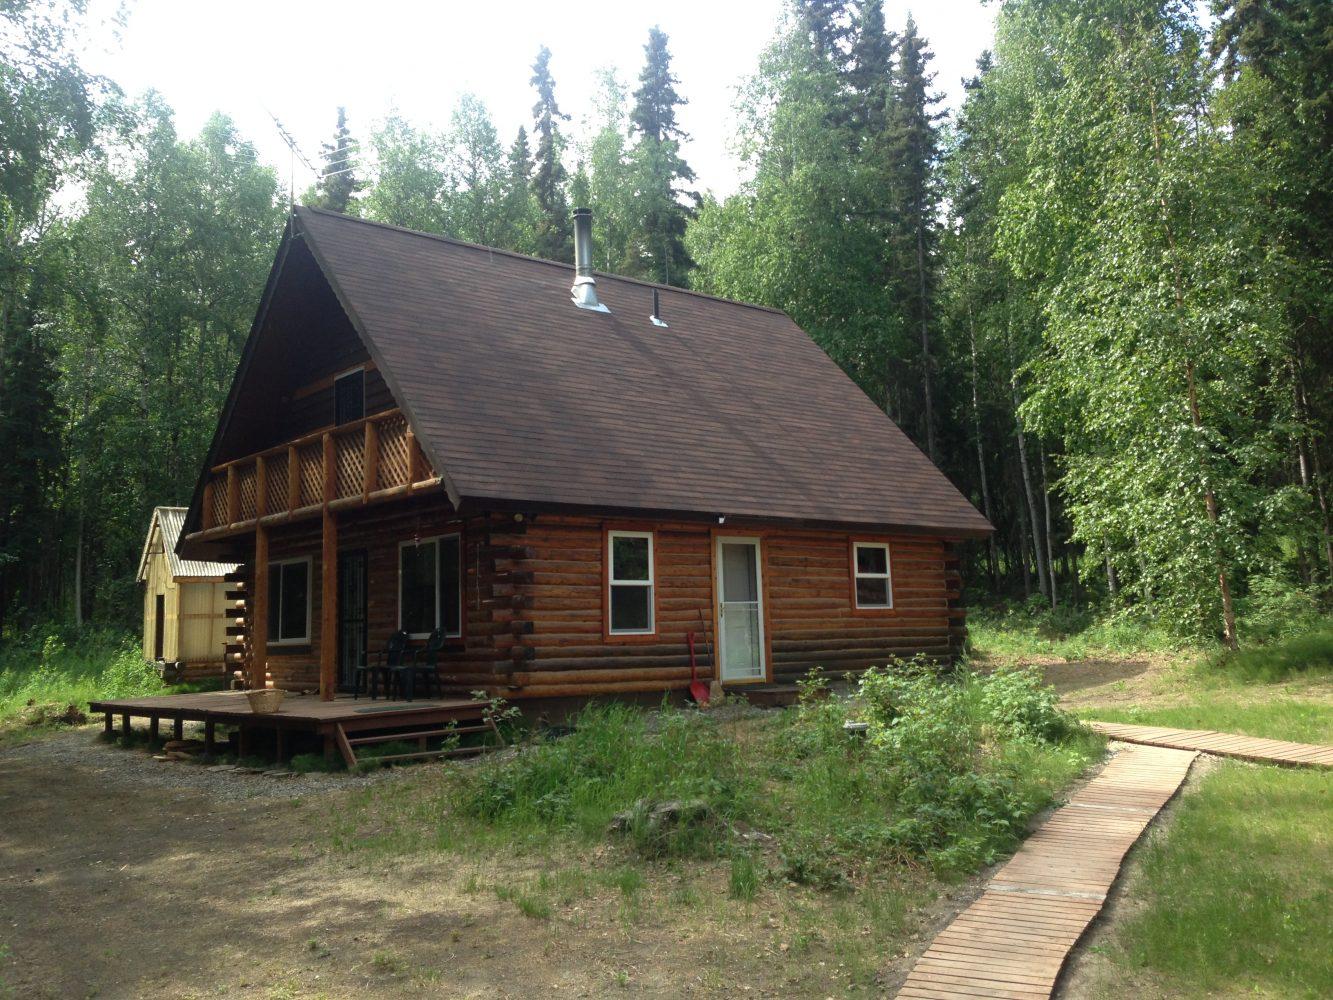 shingle roof in fairbanks alaska